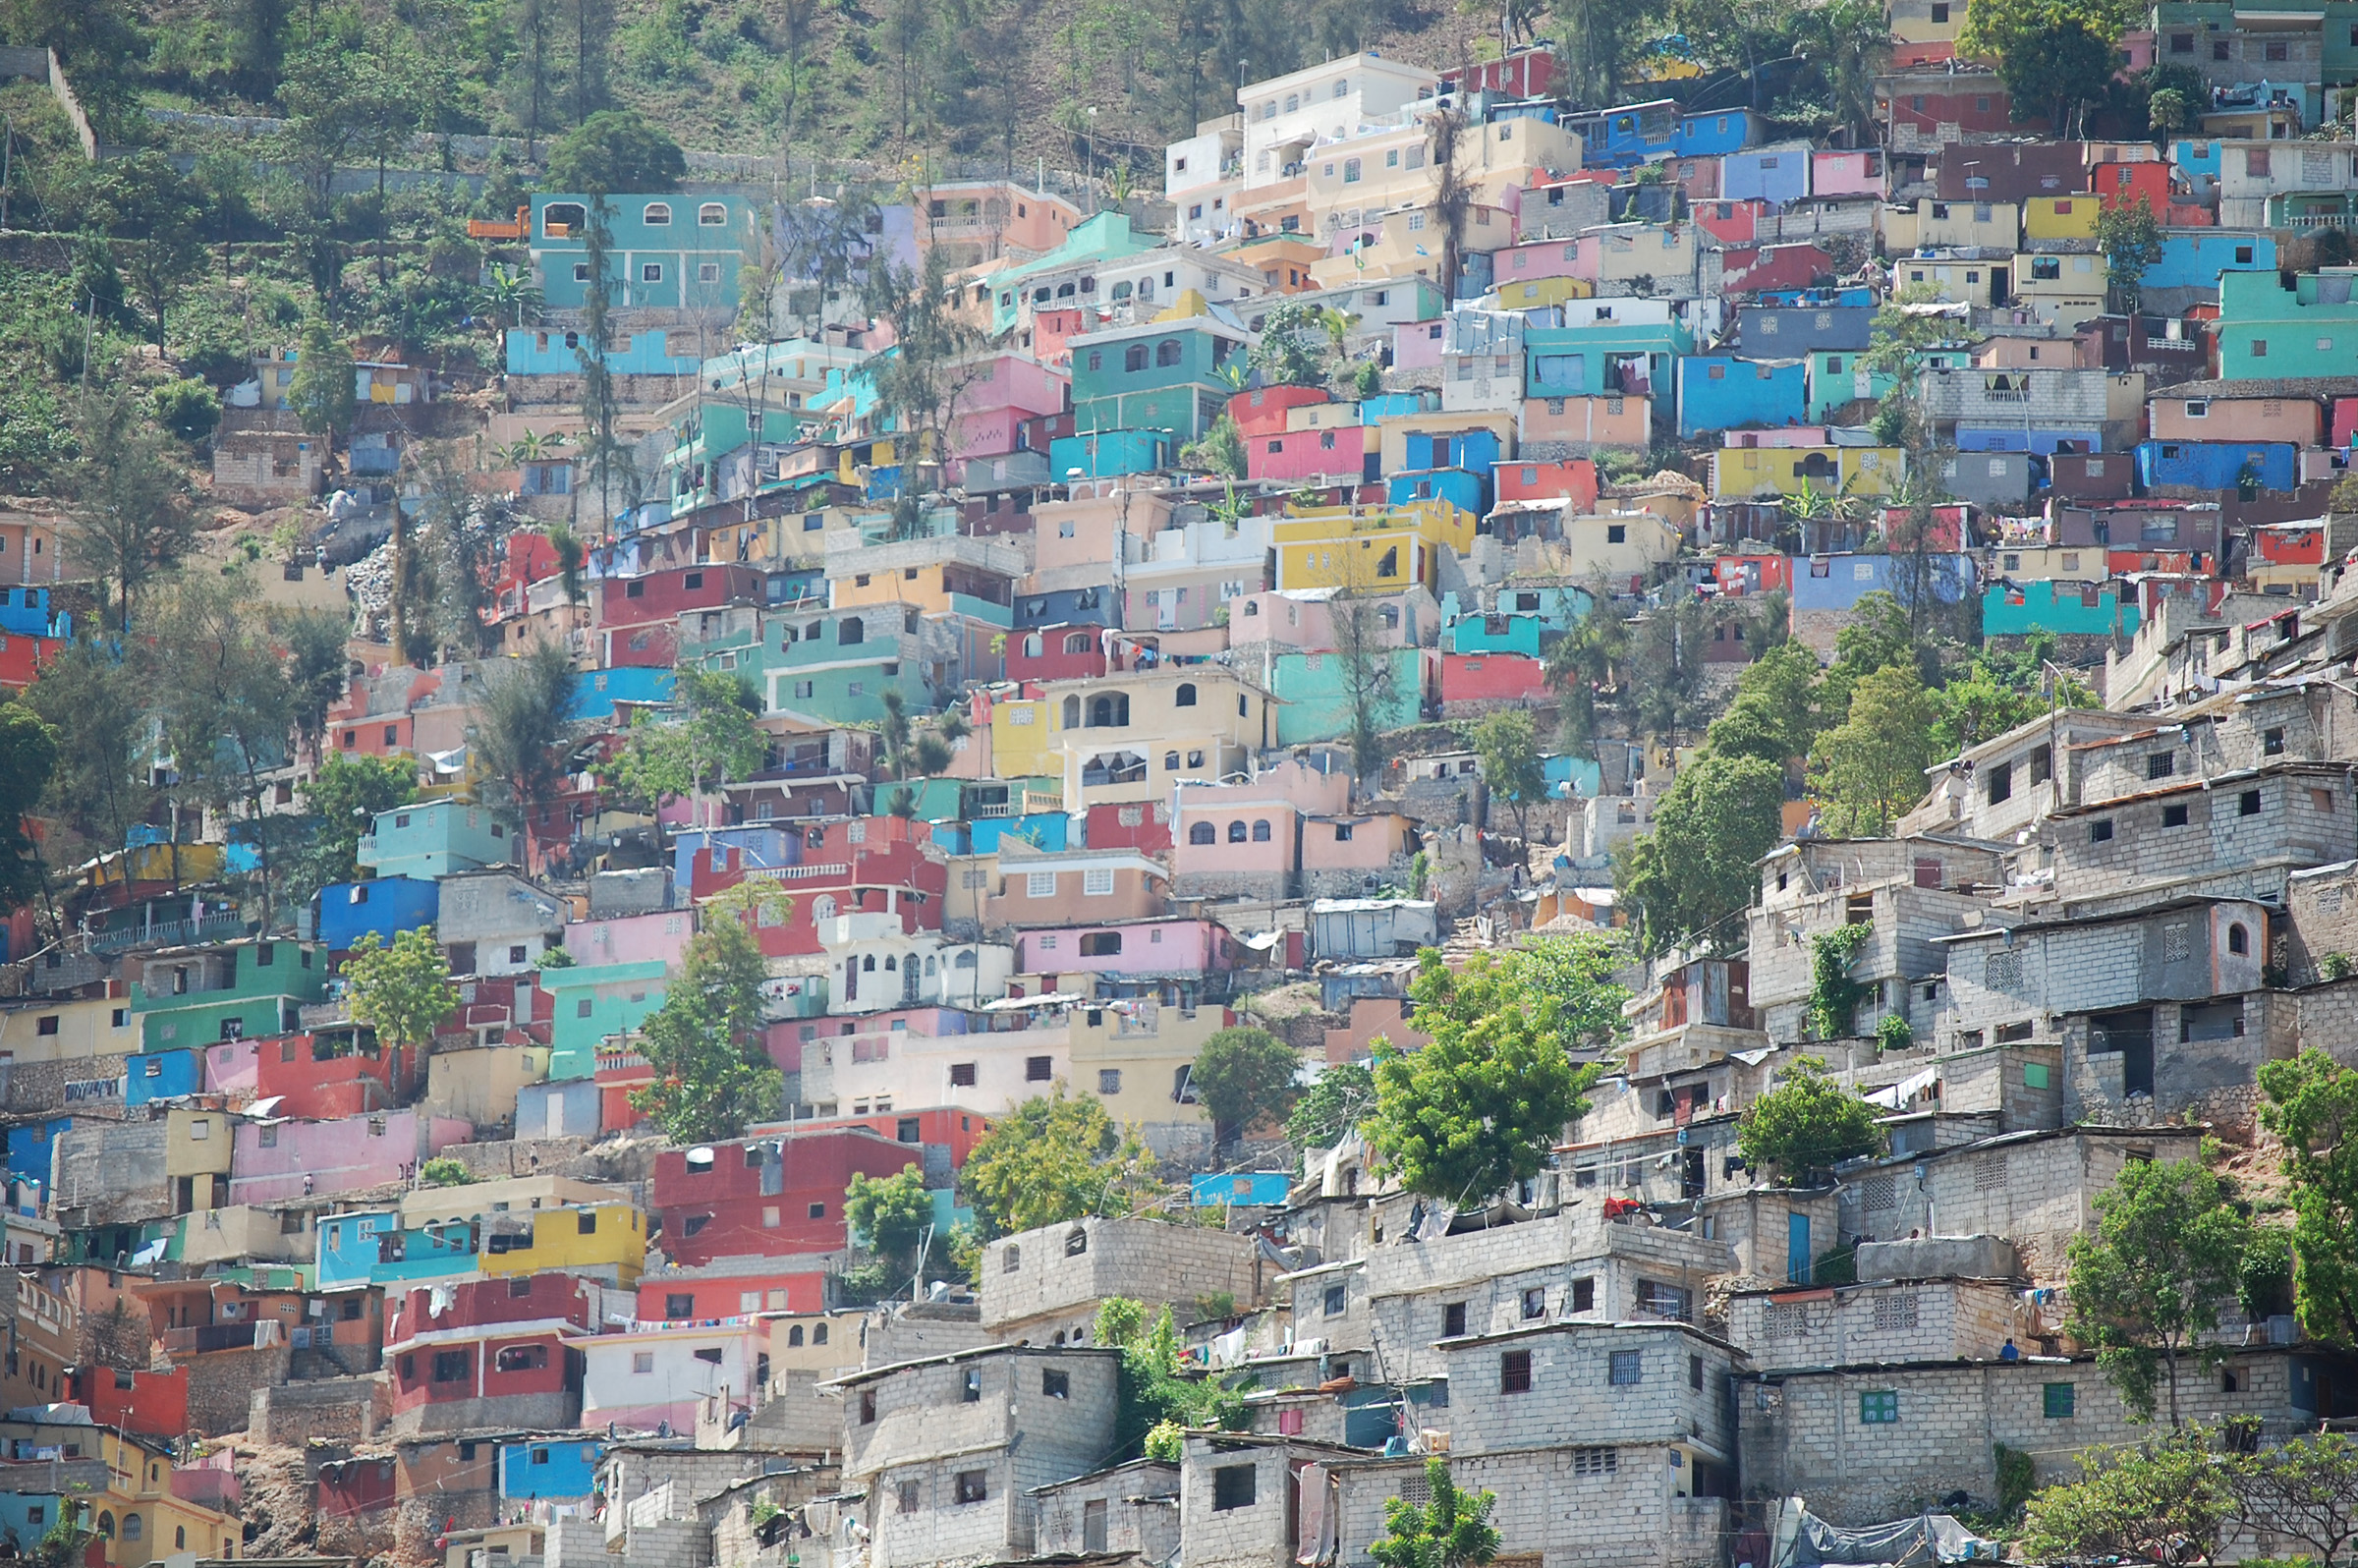 Jalousie, Port-O-Prince, Haiti